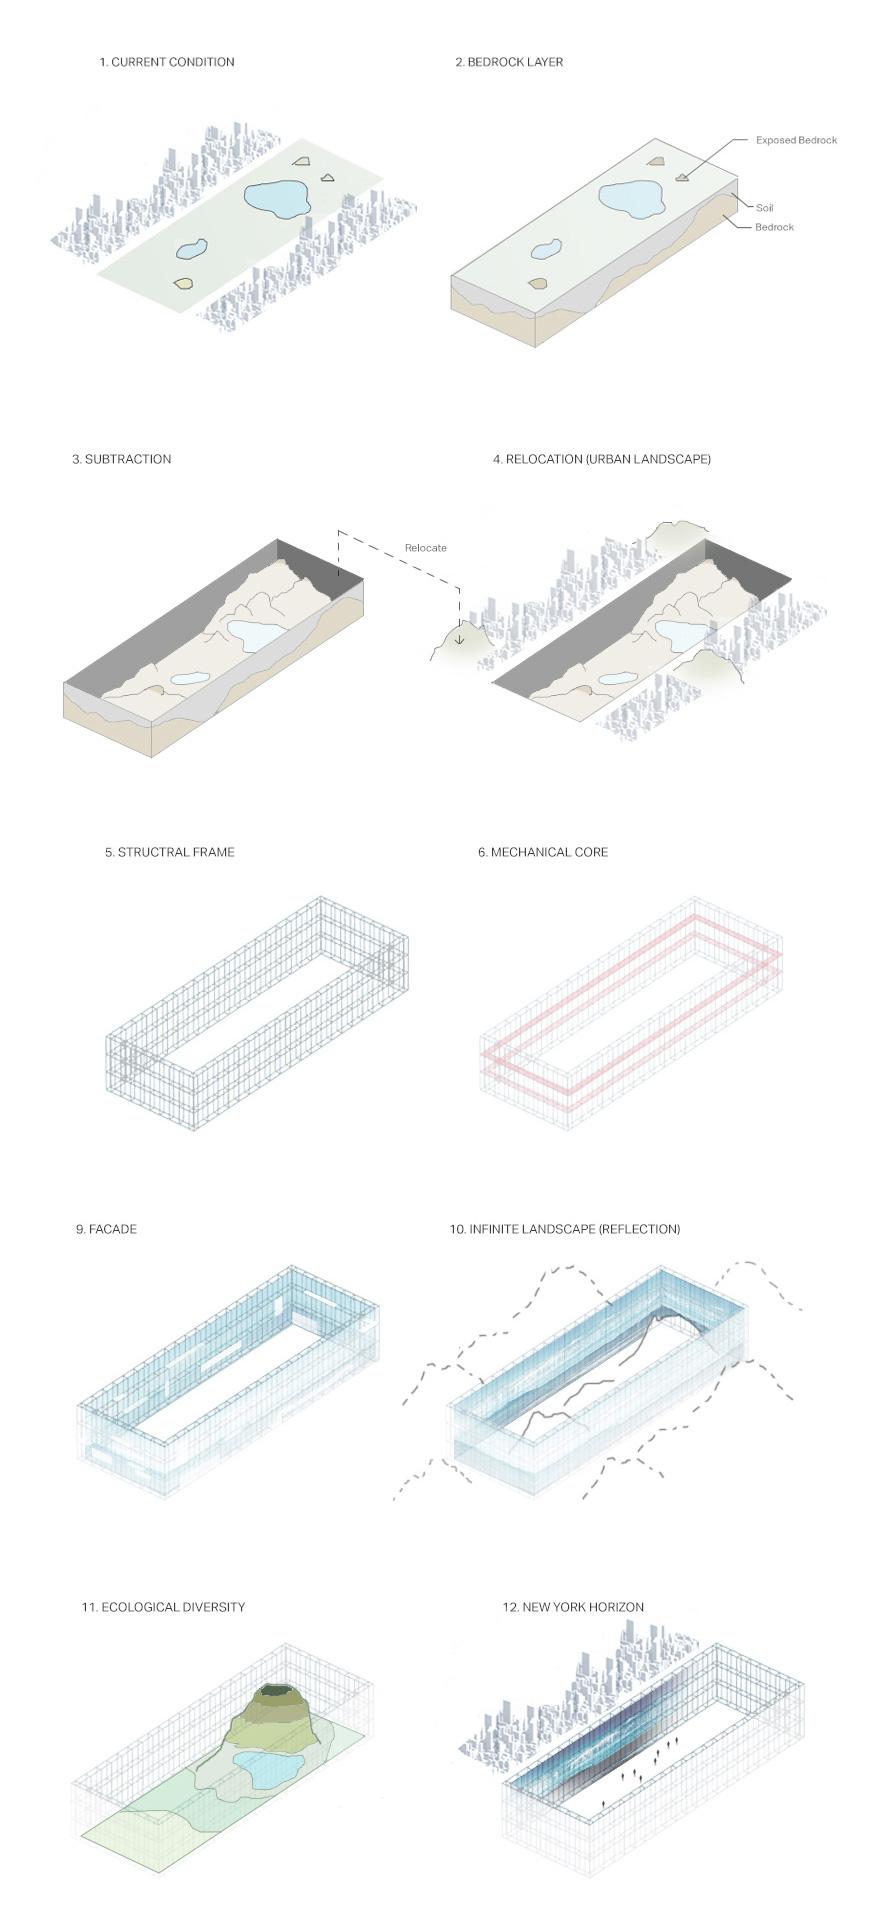 central-park-glass-walls-new-york-horizon-yitan-sun-jianshi-wu-evolo-skyscraper-competition-1